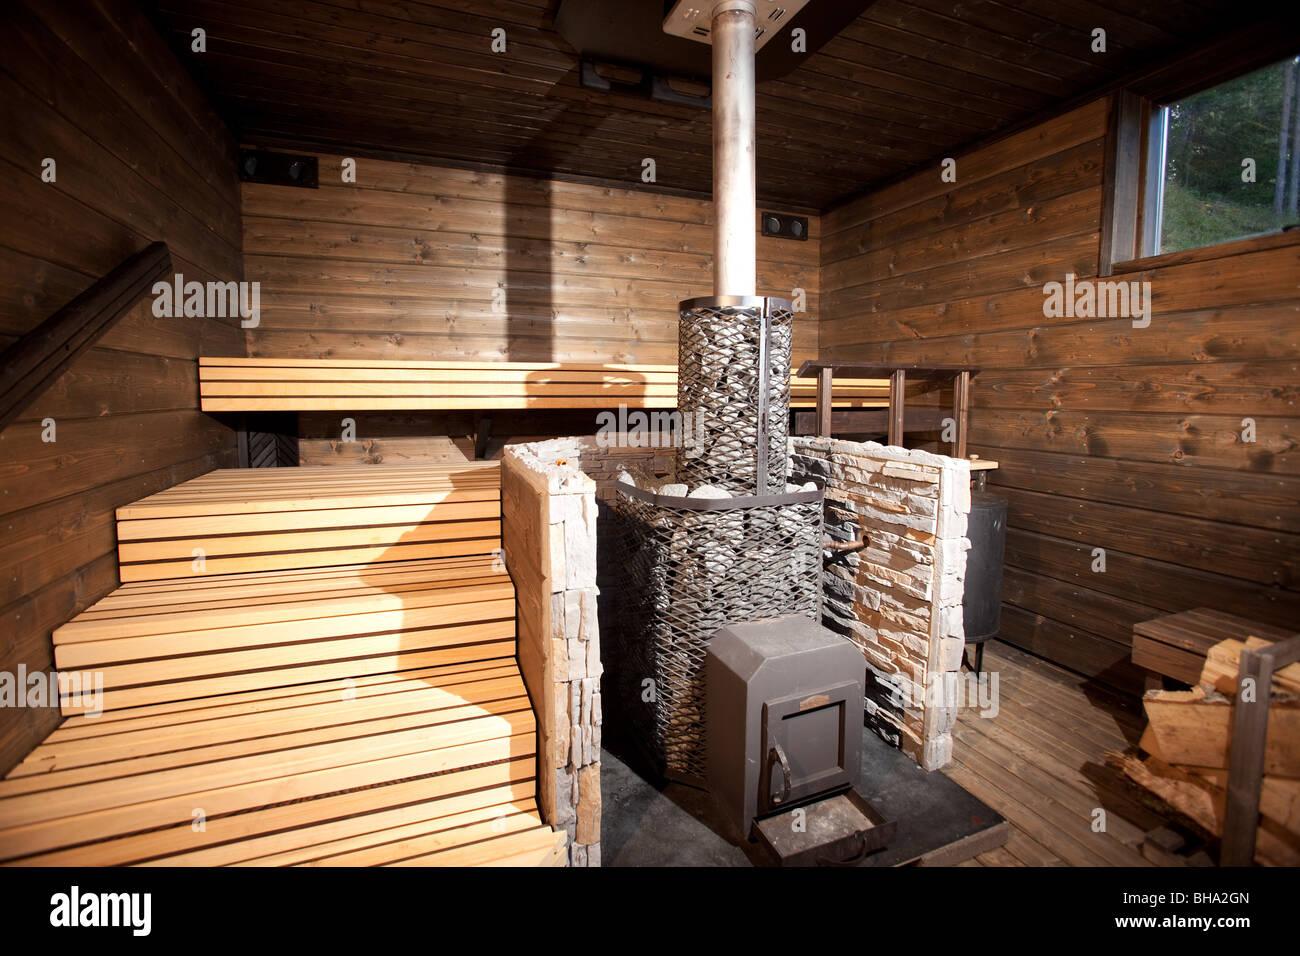 sauna stockfotos sauna bilder seite 2 alamy. Black Bedroom Furniture Sets. Home Design Ideas